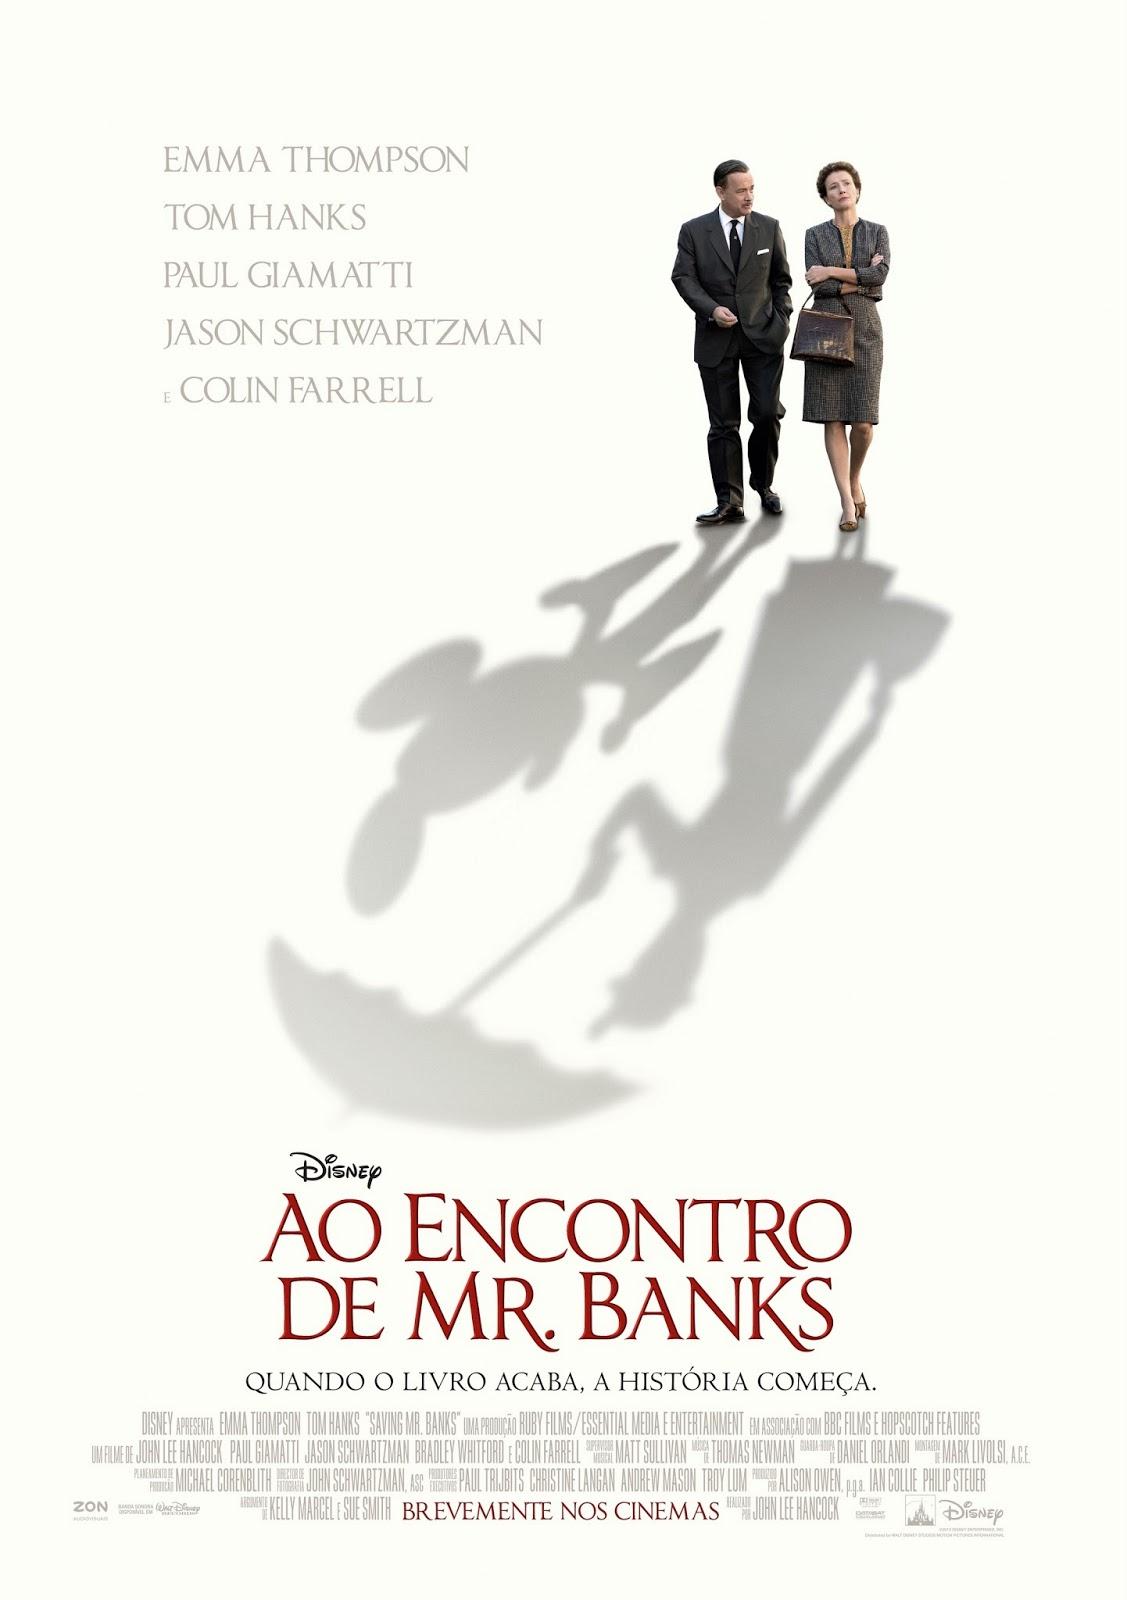 http://cinema.sapo.pt/filme/saving-mr-banks